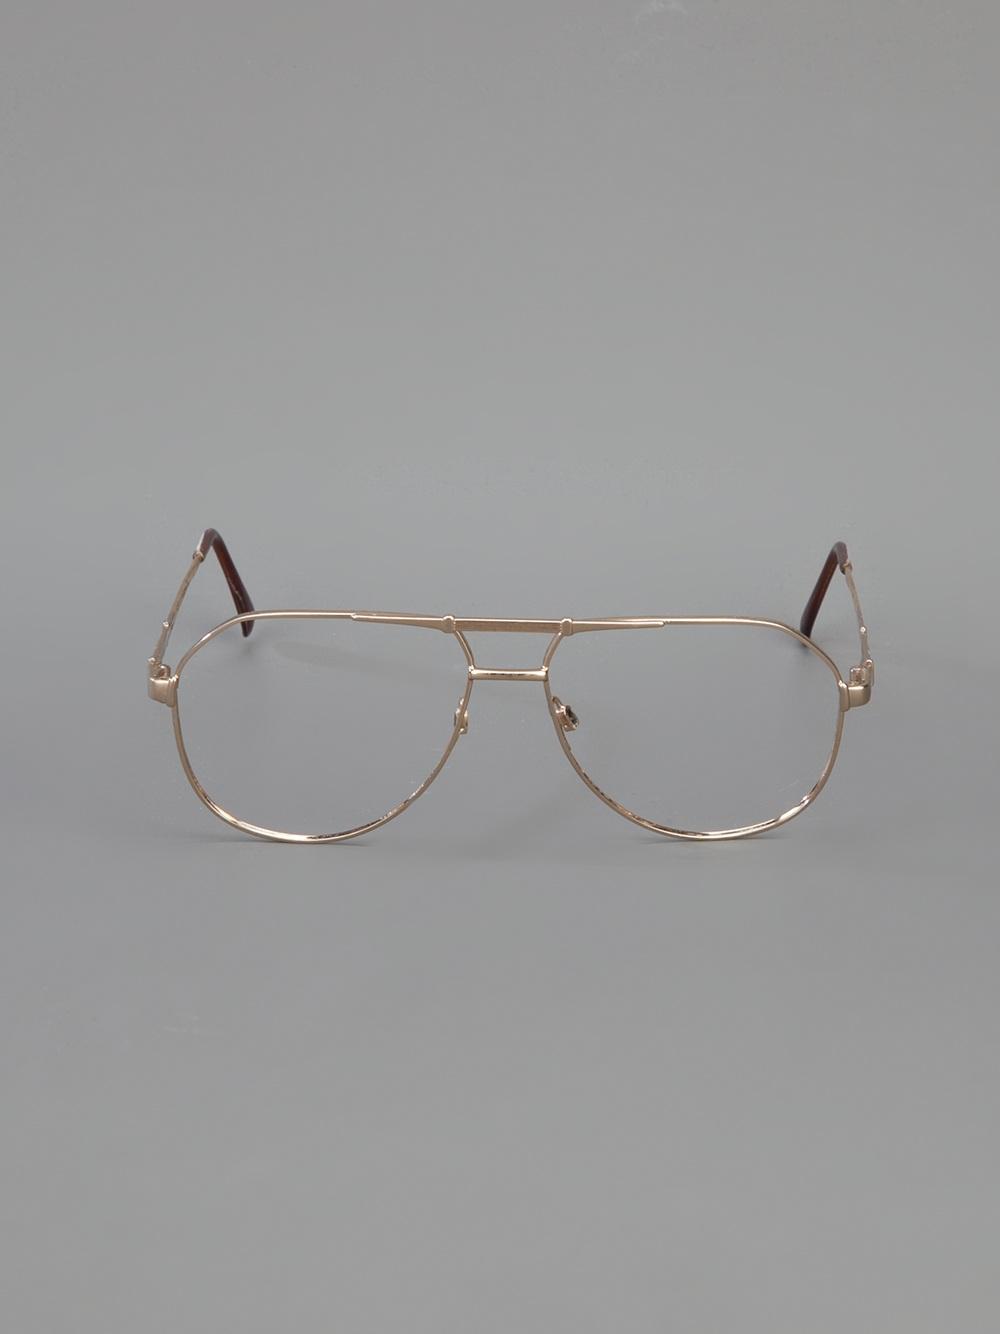 d1fdbb2d40 Valentino Glasses Vintage